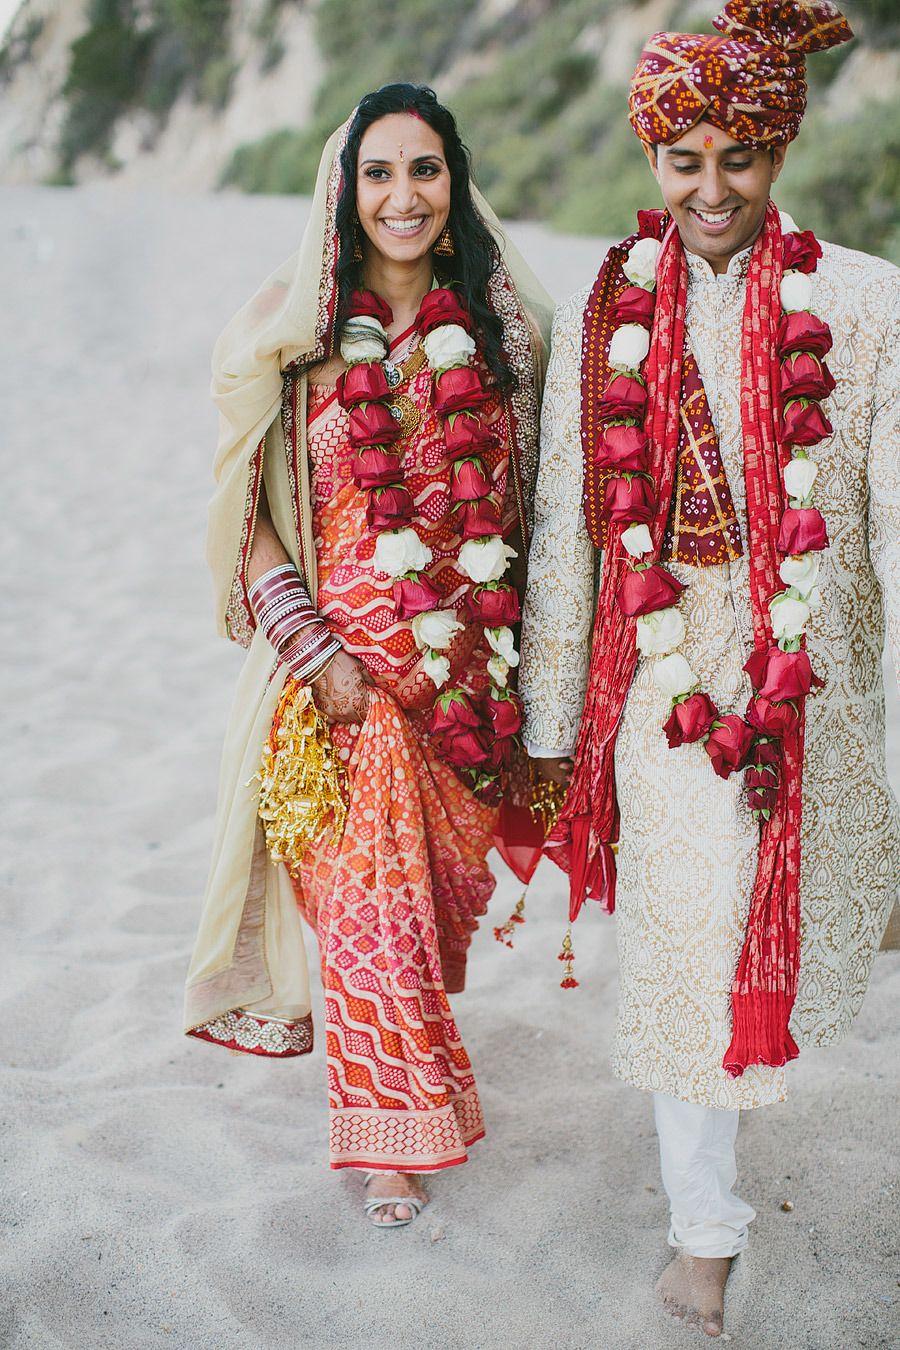 White hindu bride